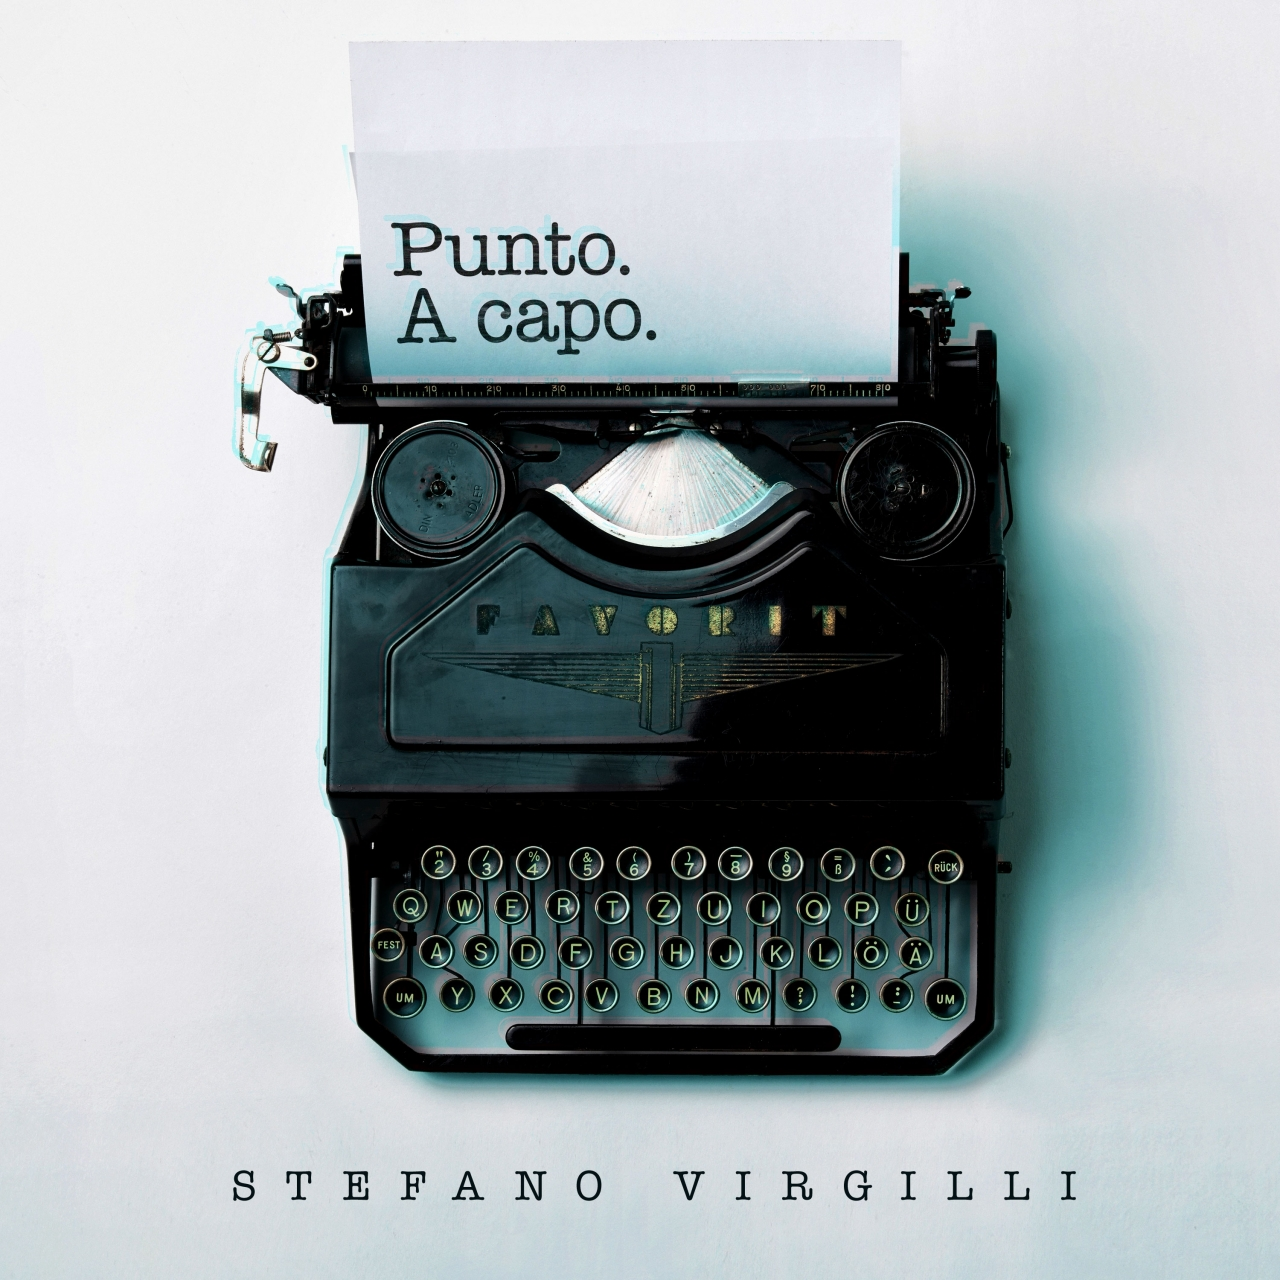 PuntoACapo.jpg